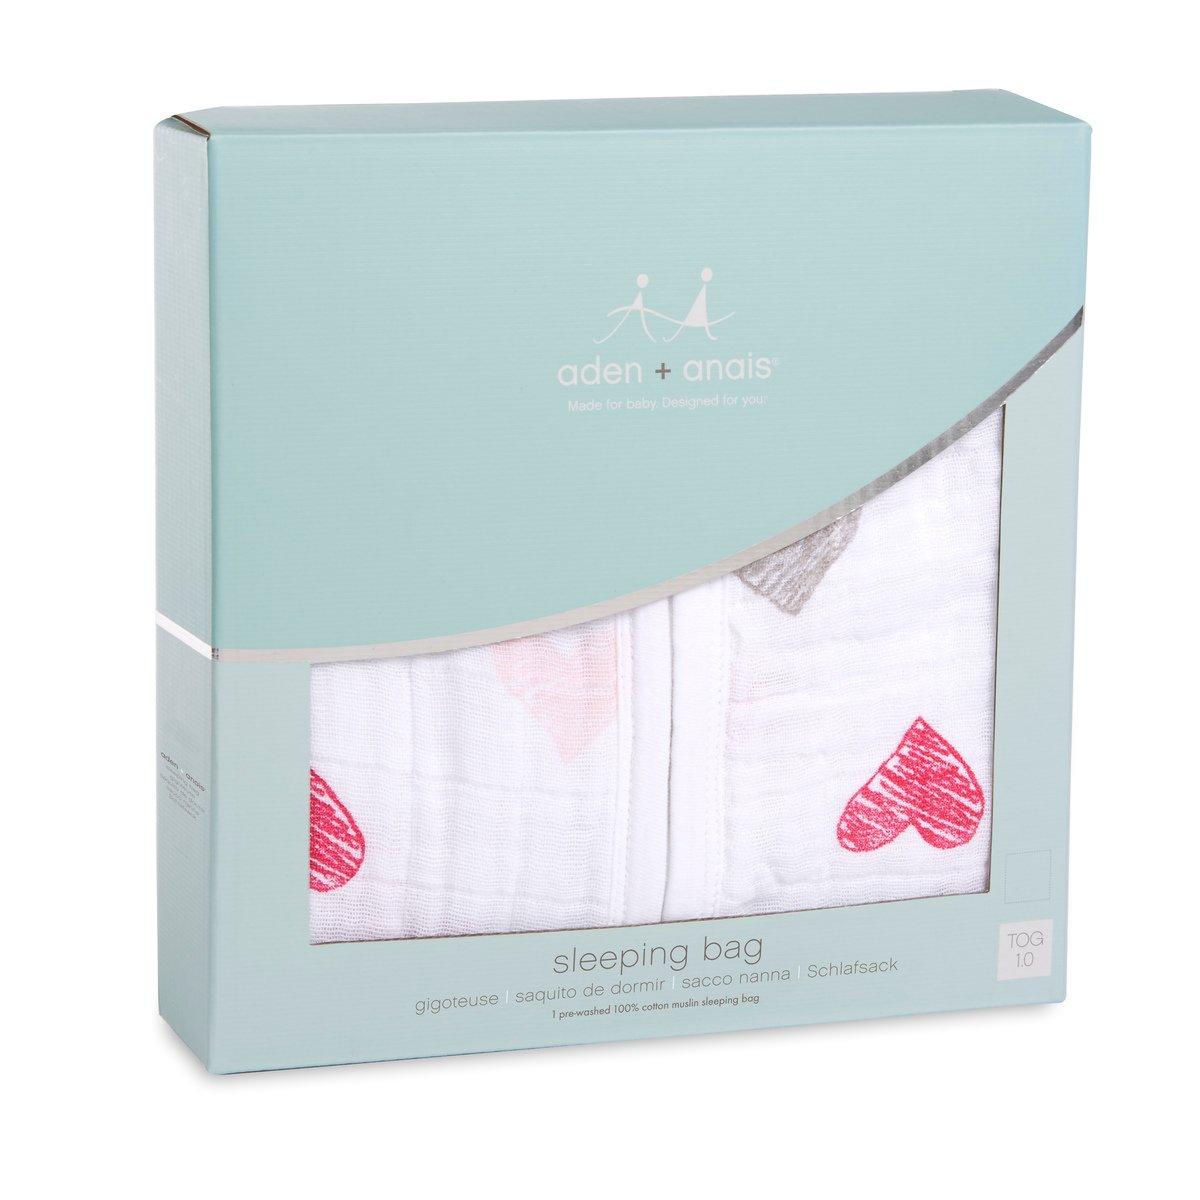 1/Tog Anais Classic muslin Sleeping bag da 6/a 12/mesi misura media Aden colore: Rosso//Giallo//Verde